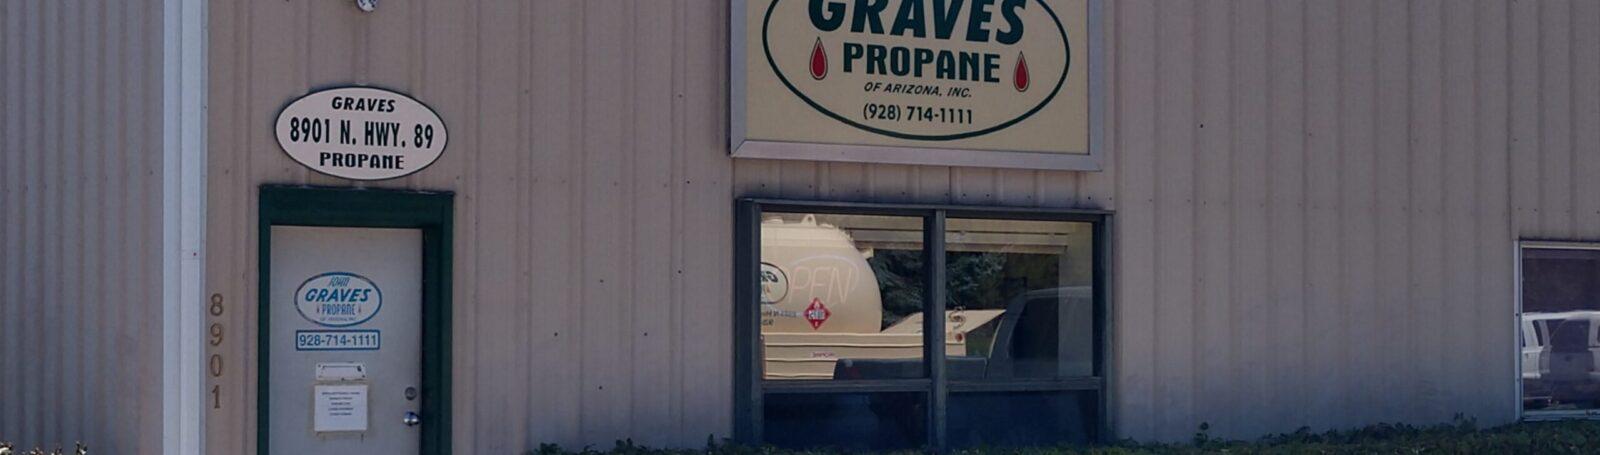 Flagstaff Propane Office on 89N